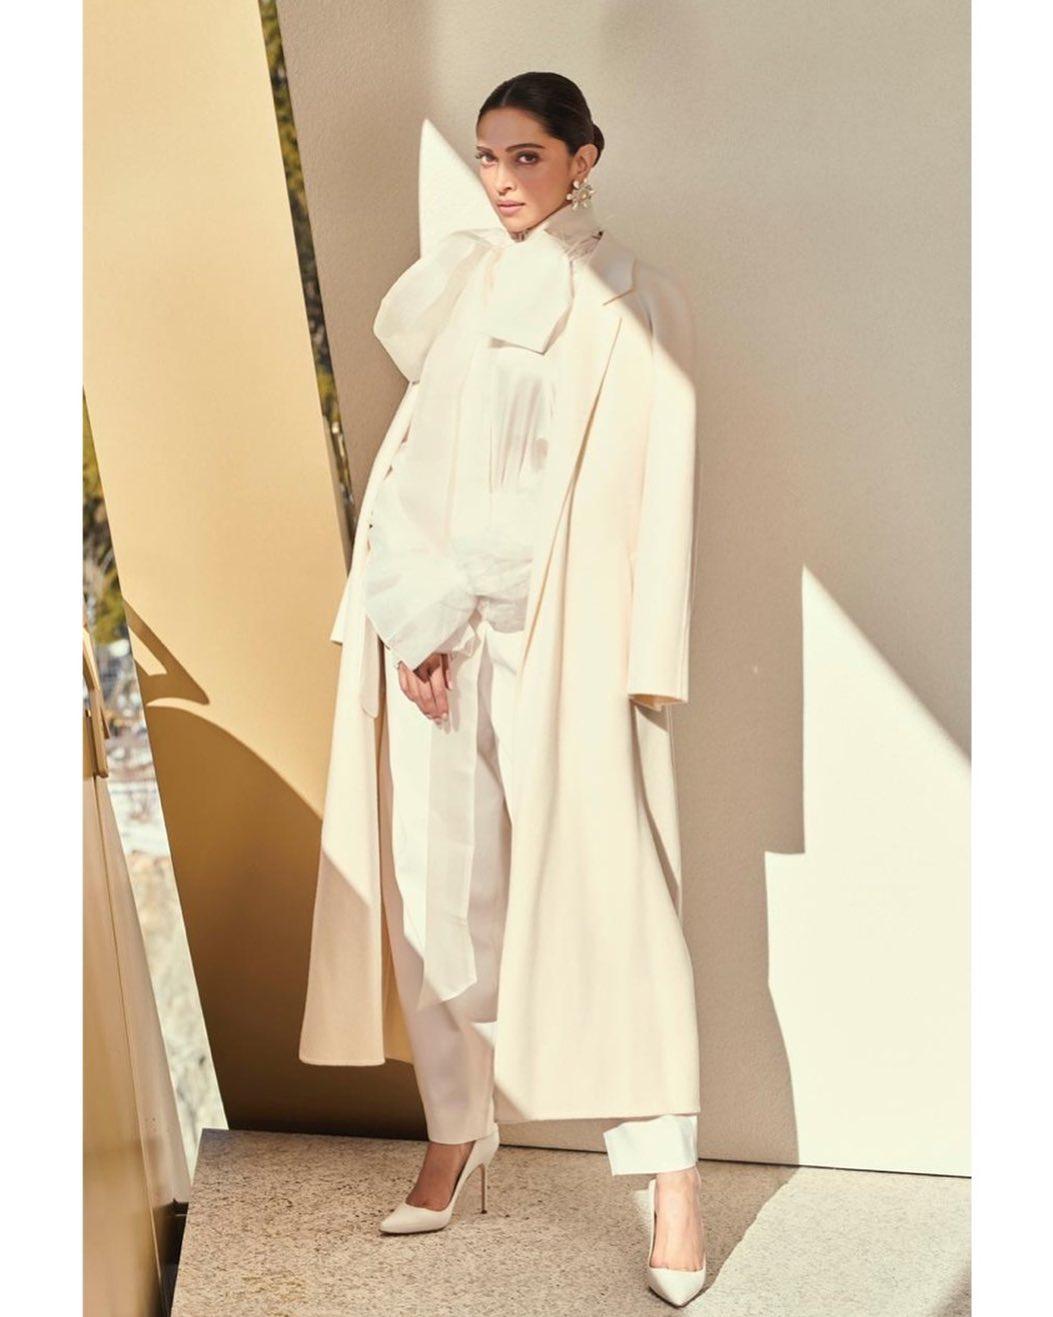 How to Rock a Long Coat a la Deepika Padukone, Sonam Kapoor